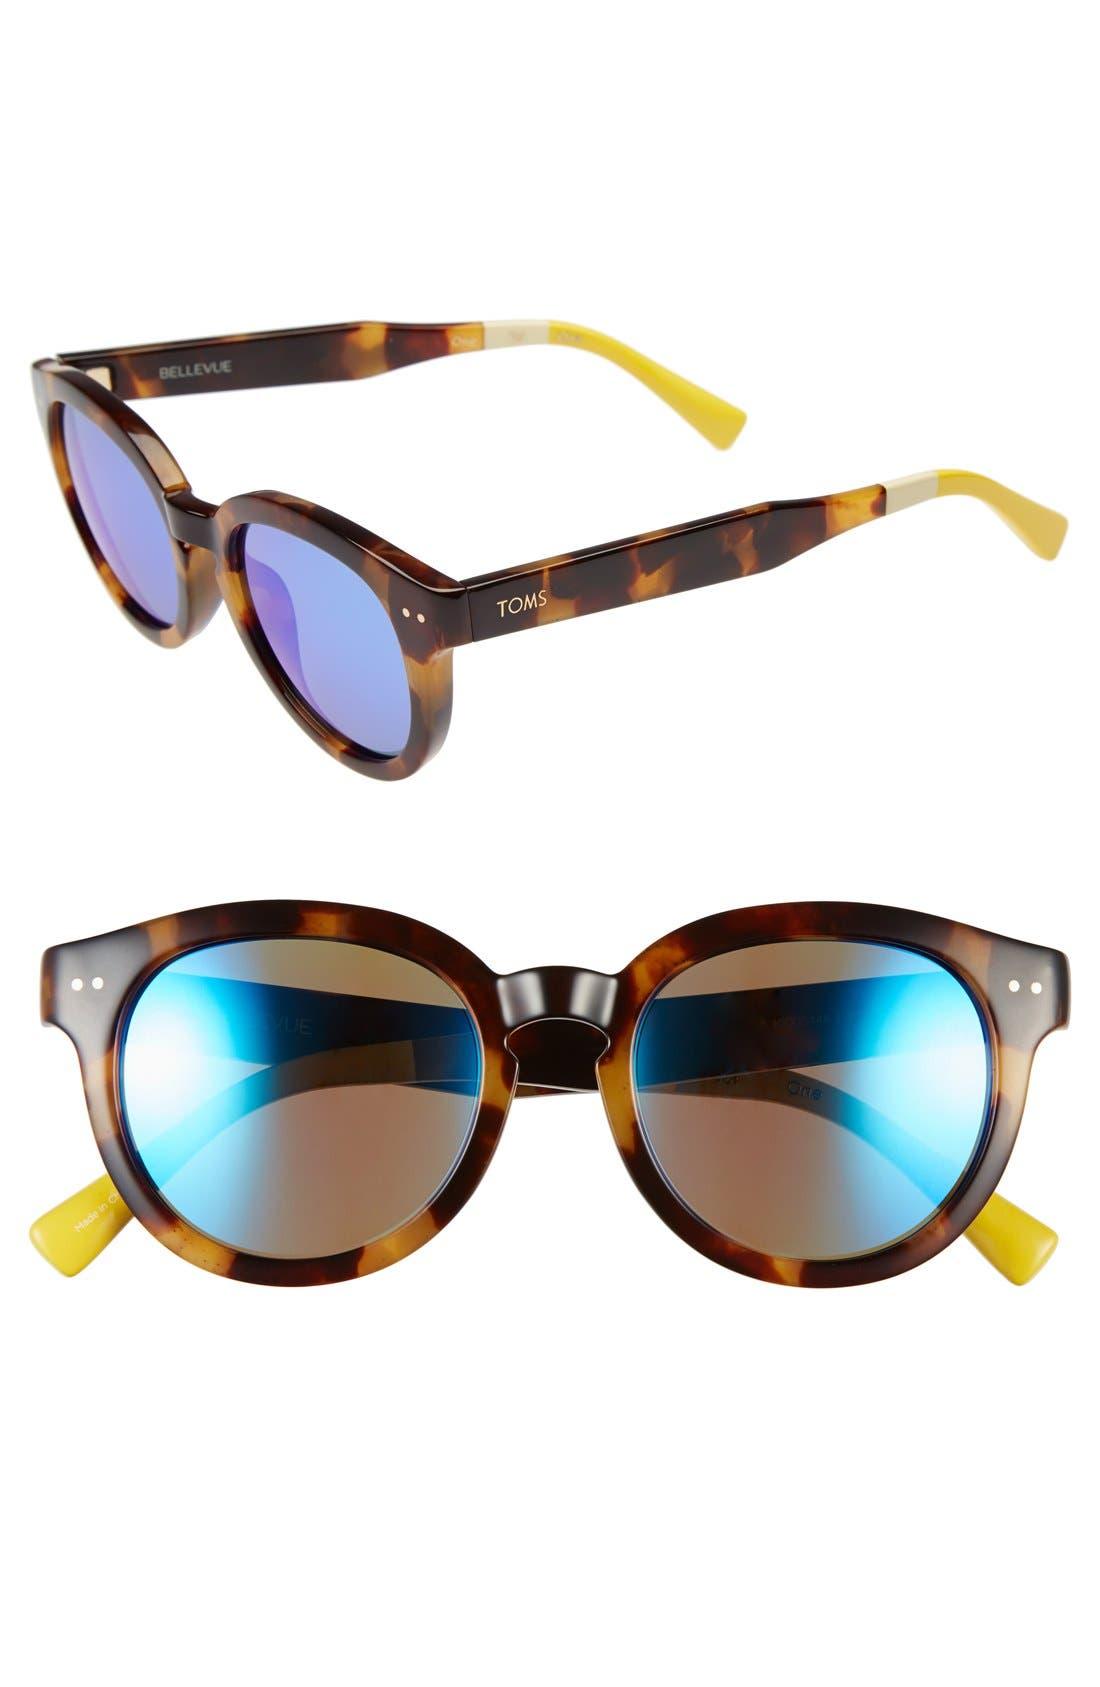 Alternate Image 1 Selected - TOMS 'Bellevue' 51mm Retro Sunglasses